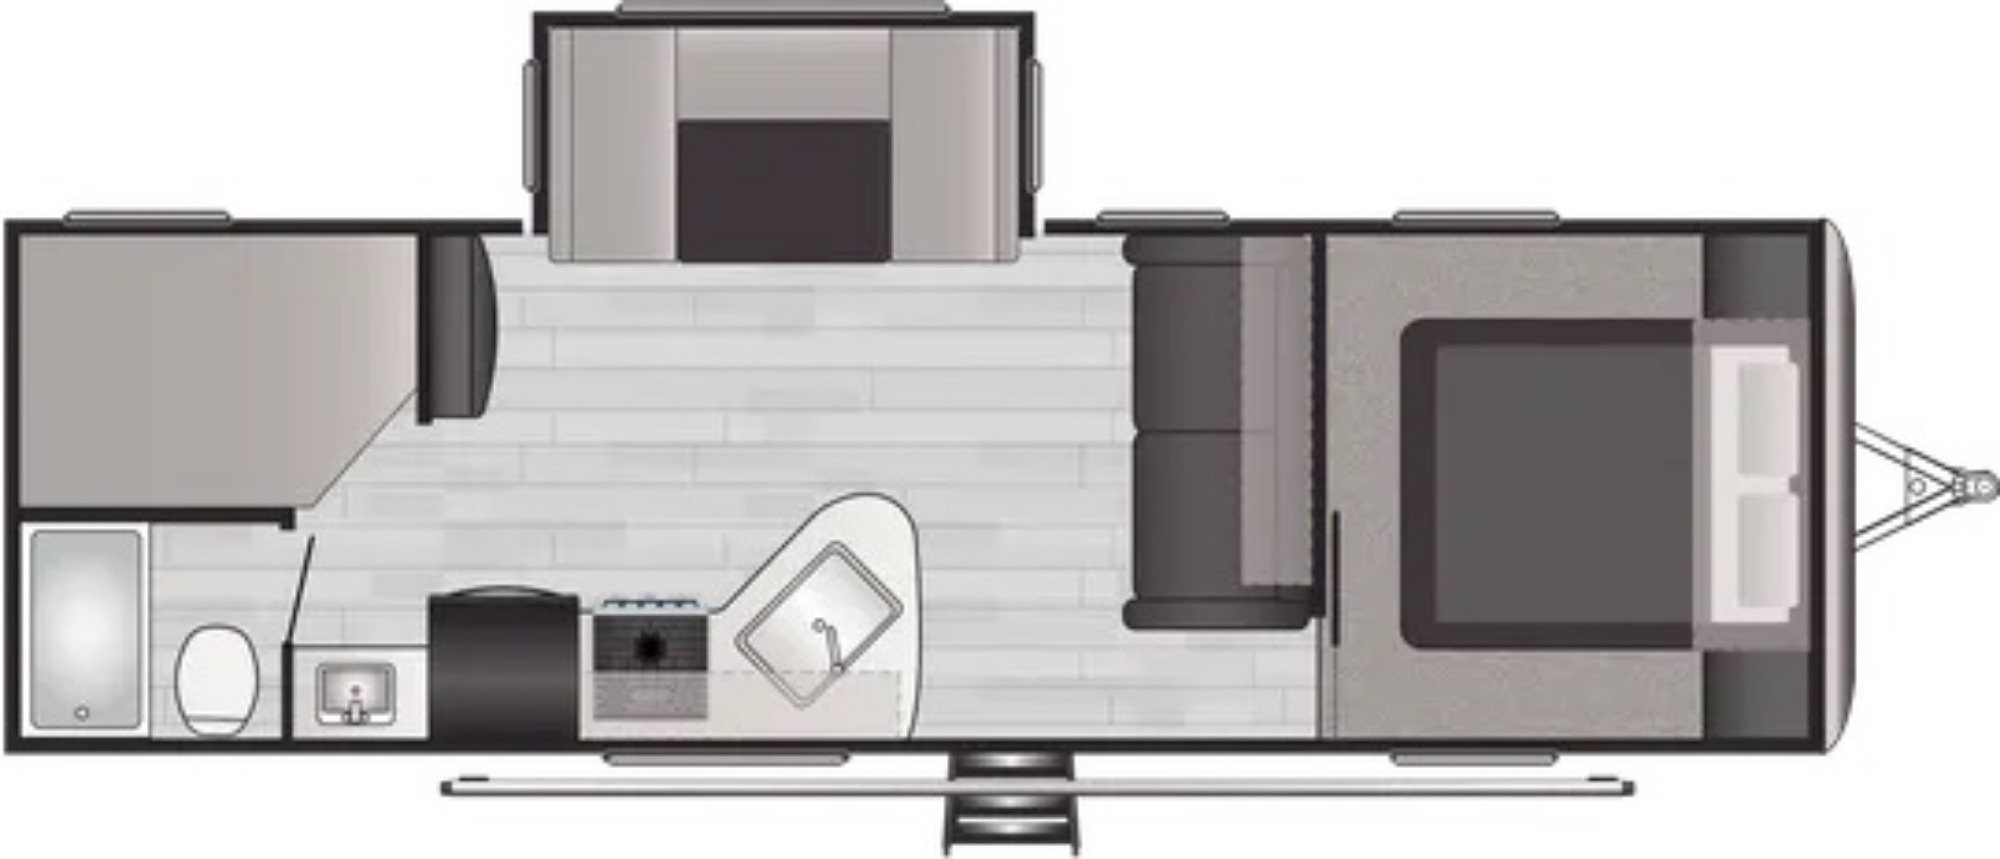 View Floor Plan for 2022 KEYSTONE SPRINGDALE 275BH